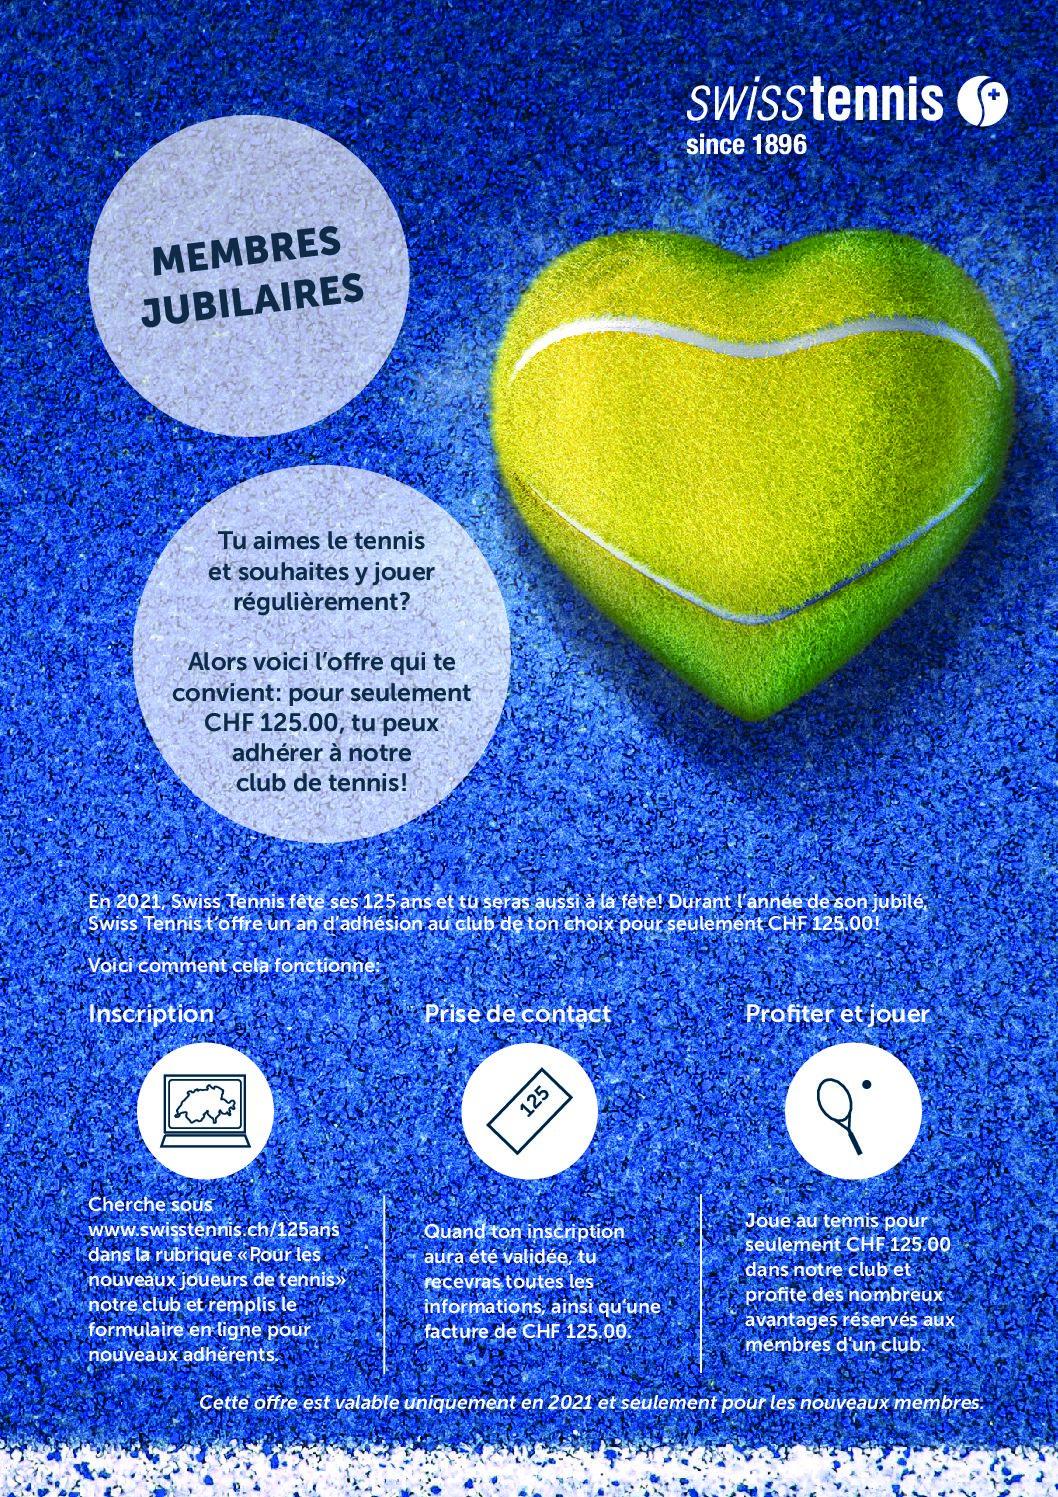 Offre exceptionnelle Swiss Tennis